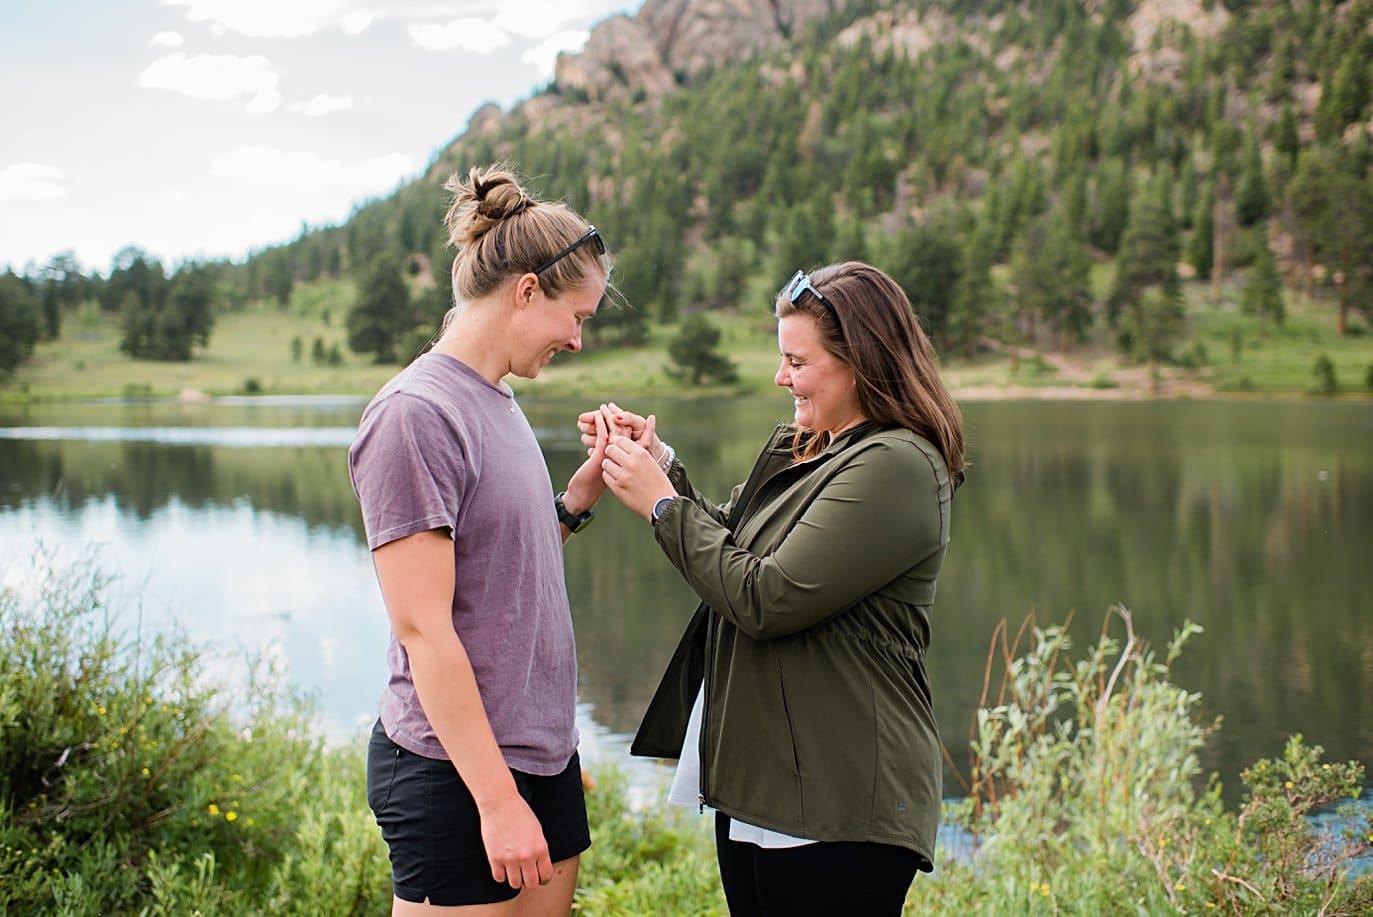 brides check out ring after Estes Park Lily Lake by Estes Park wedding photographer Jennie Crate